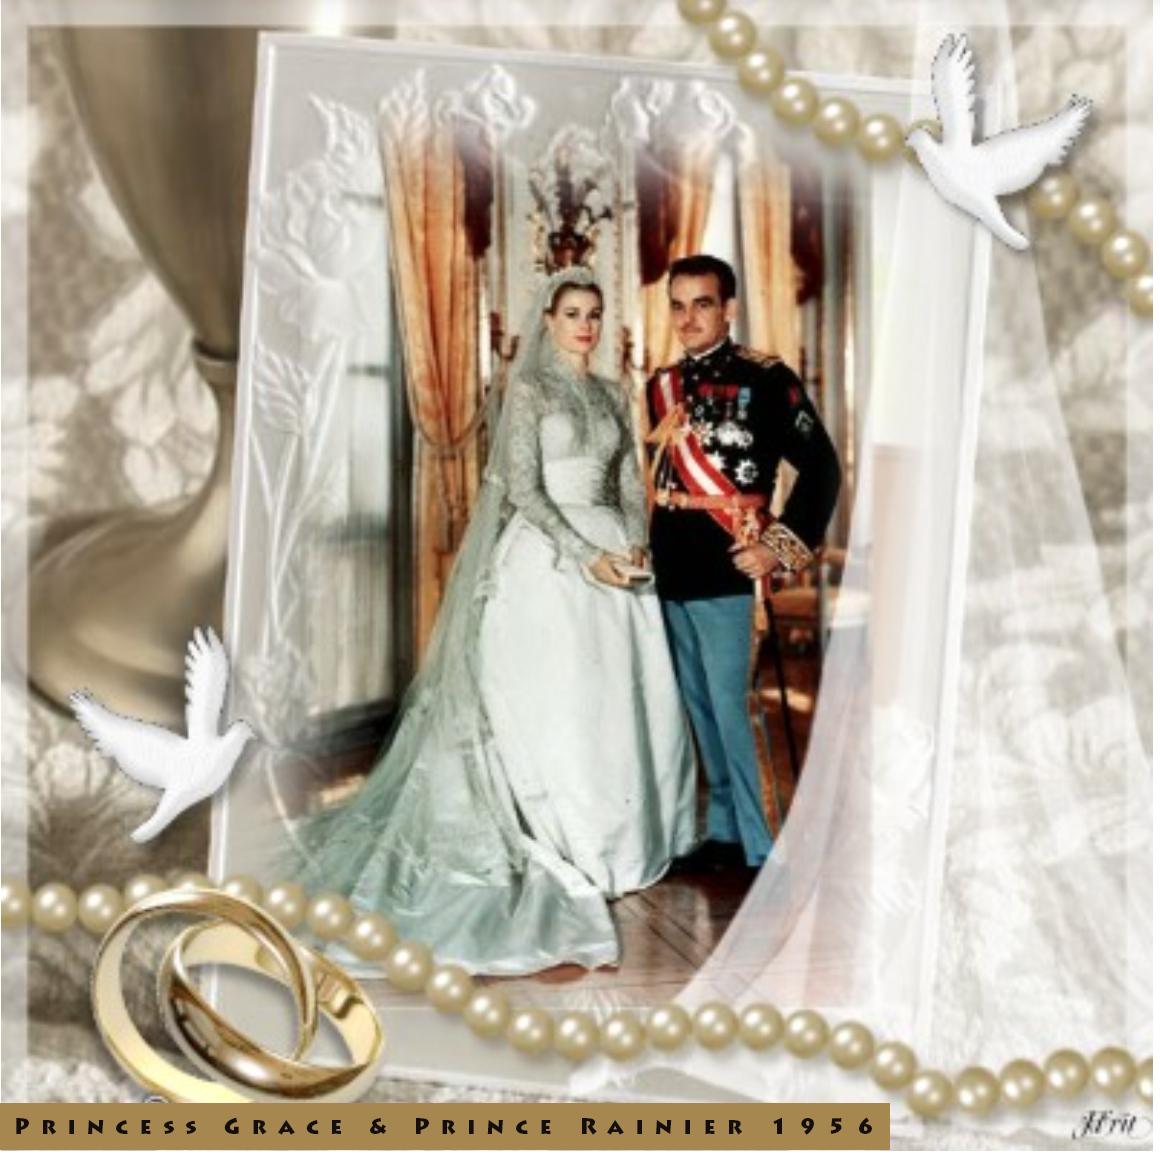 Grace Kelly Wedding Anniversary - Princess Grace & Prince Rainier